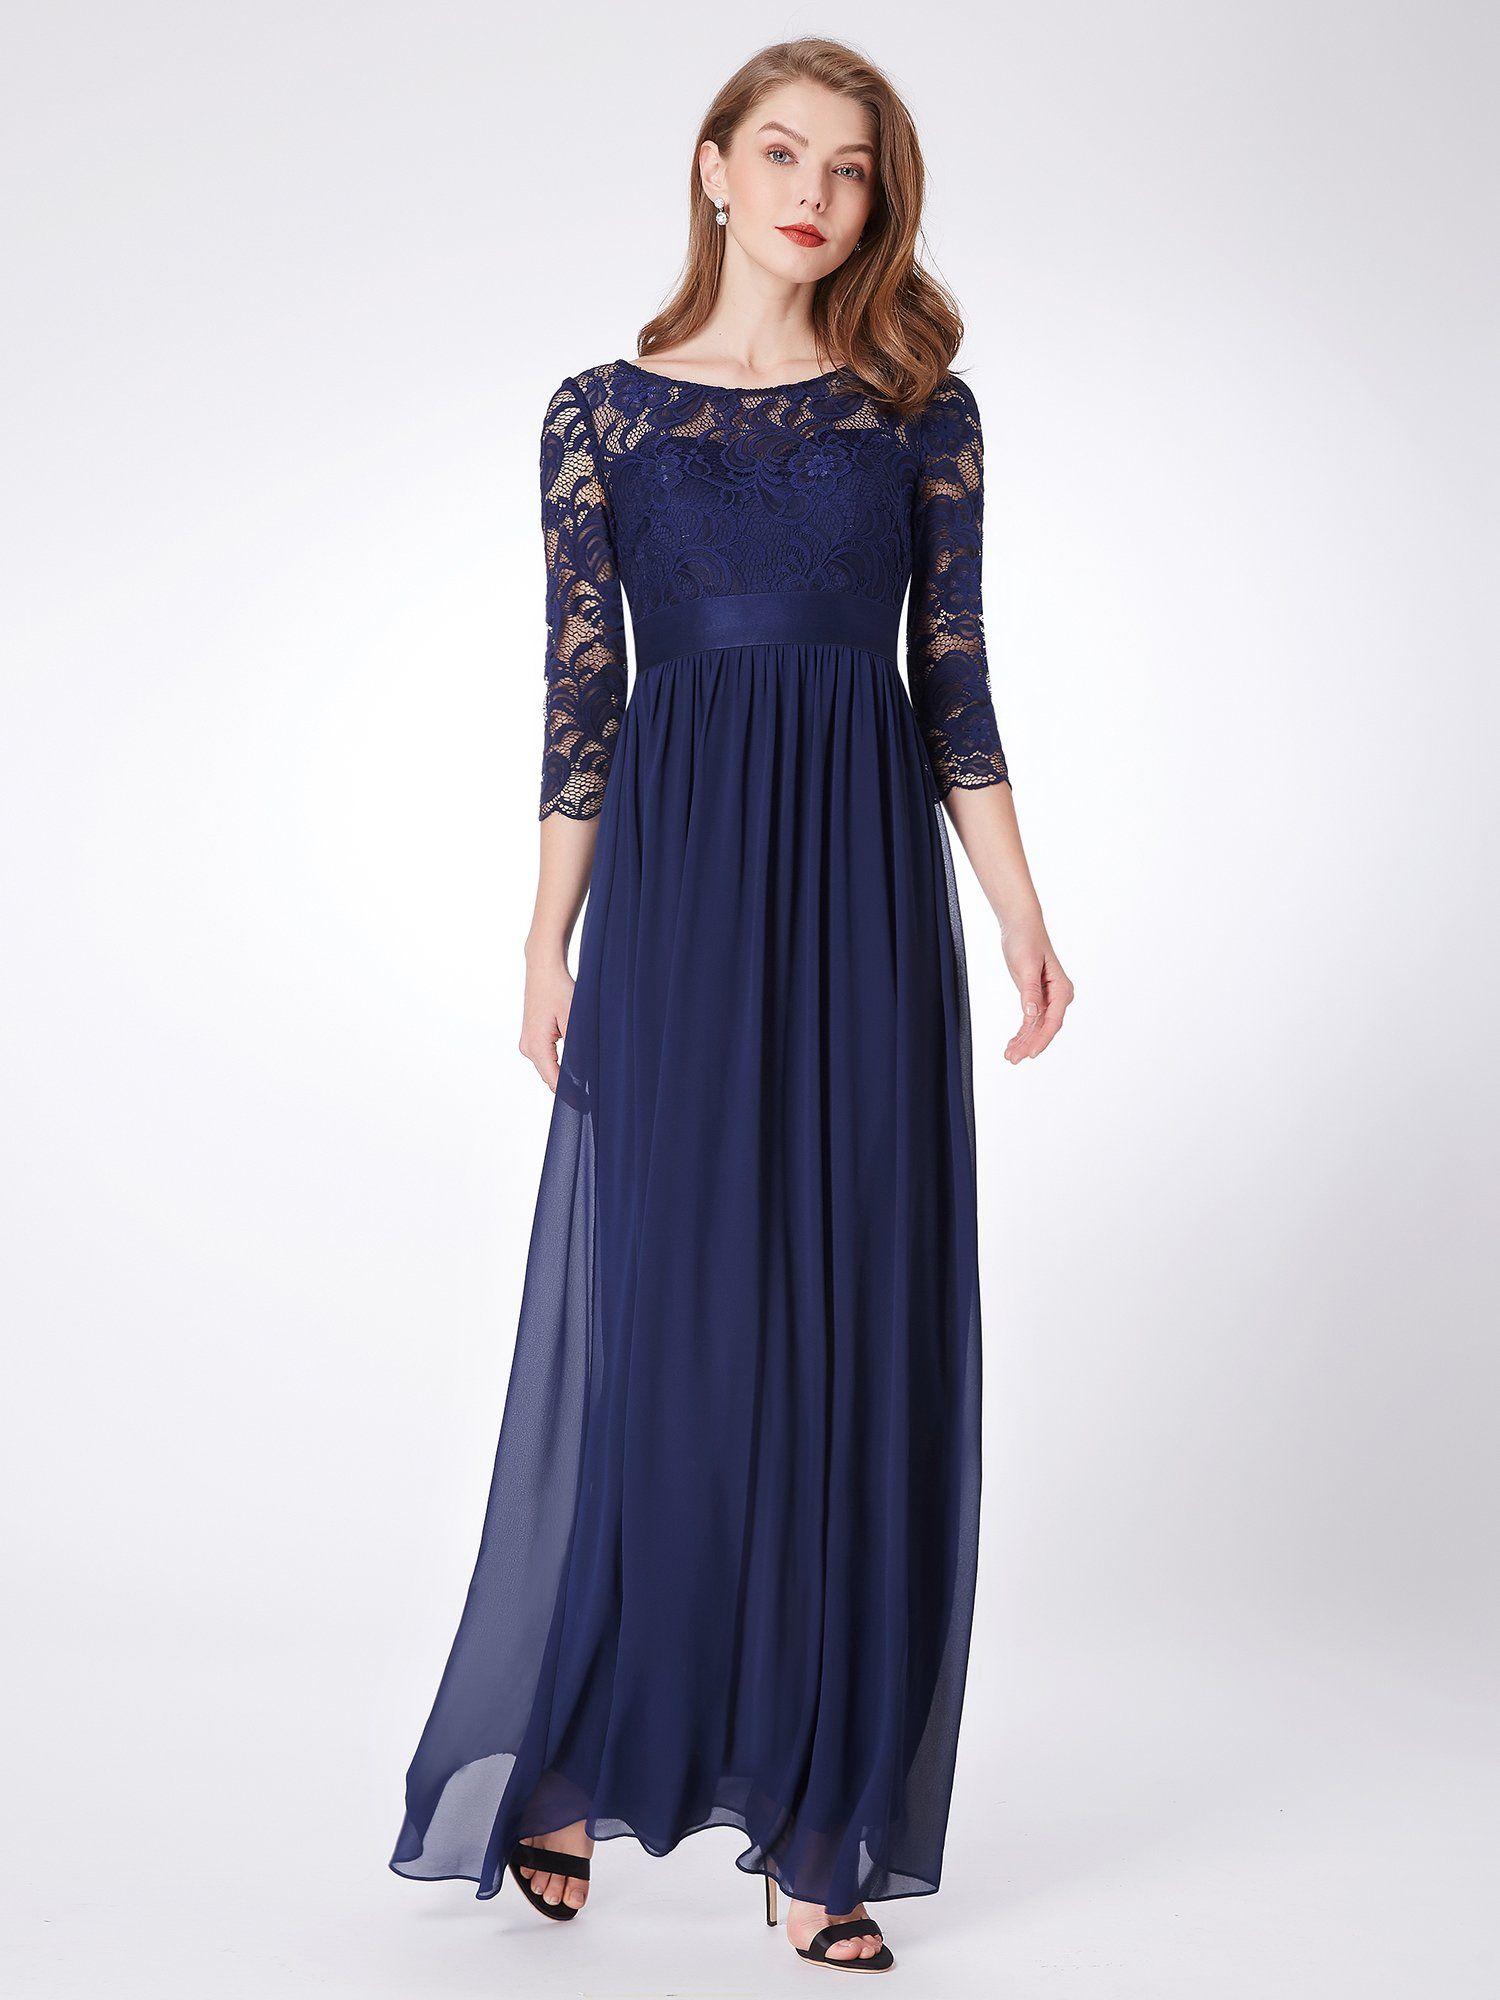 Everpretty women lace elegant 34 sleeve empire waist maxi